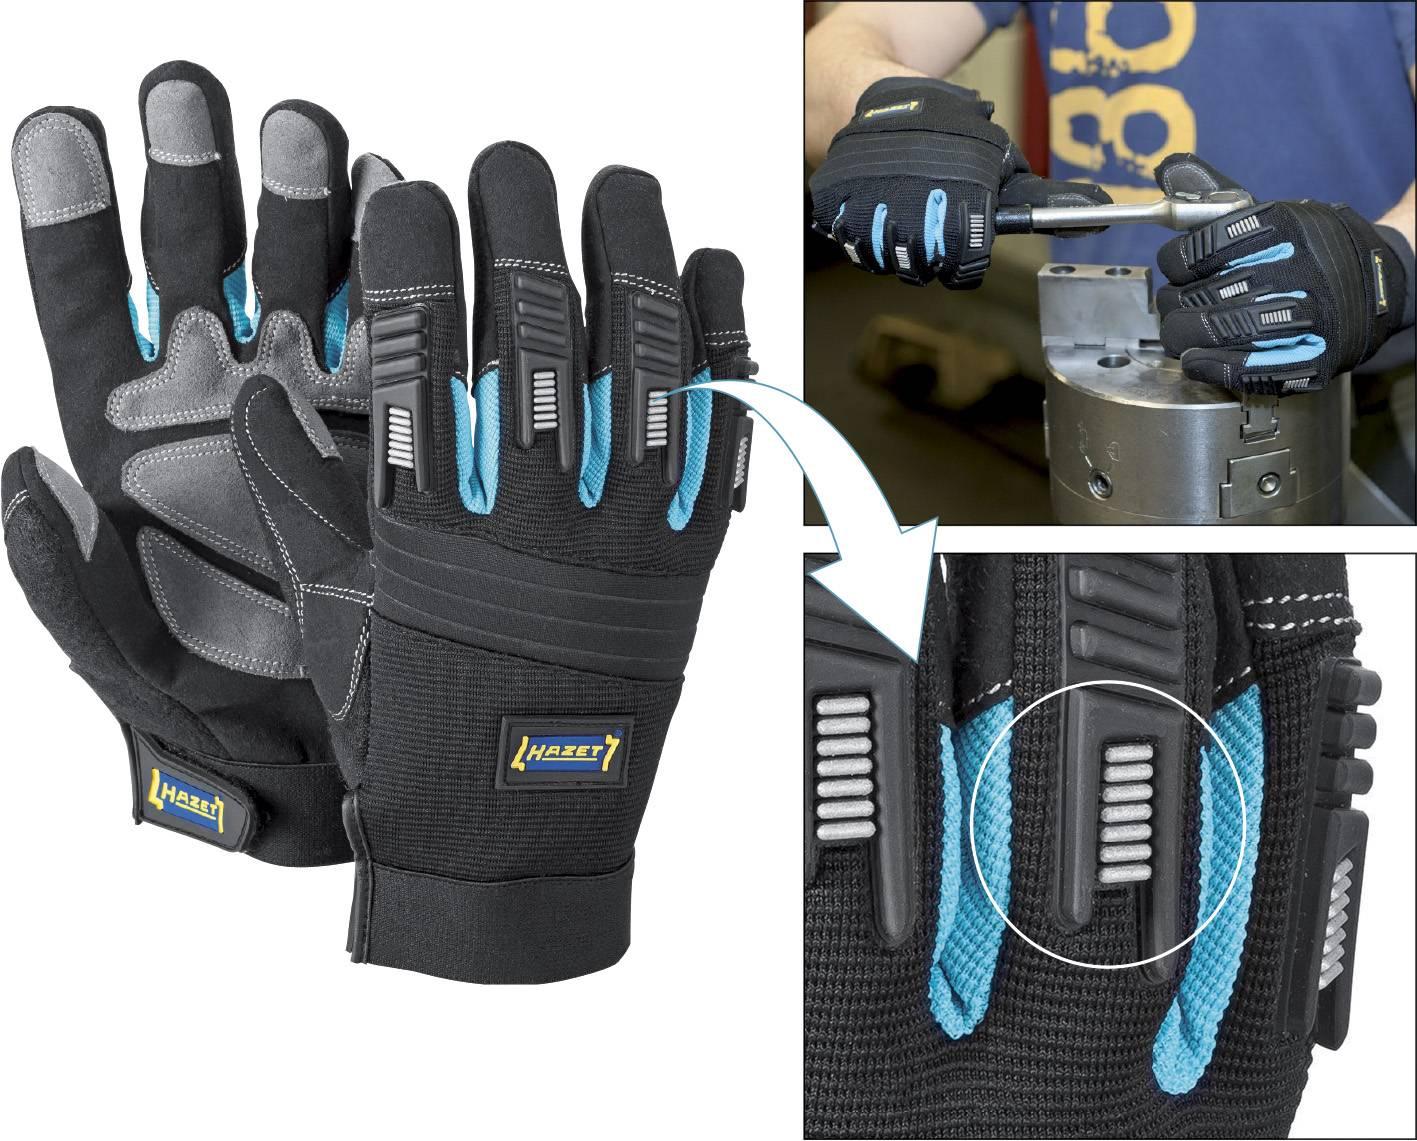 Odolné montážne rukavice pro mechanikov Hazet 1987-5XL, XL